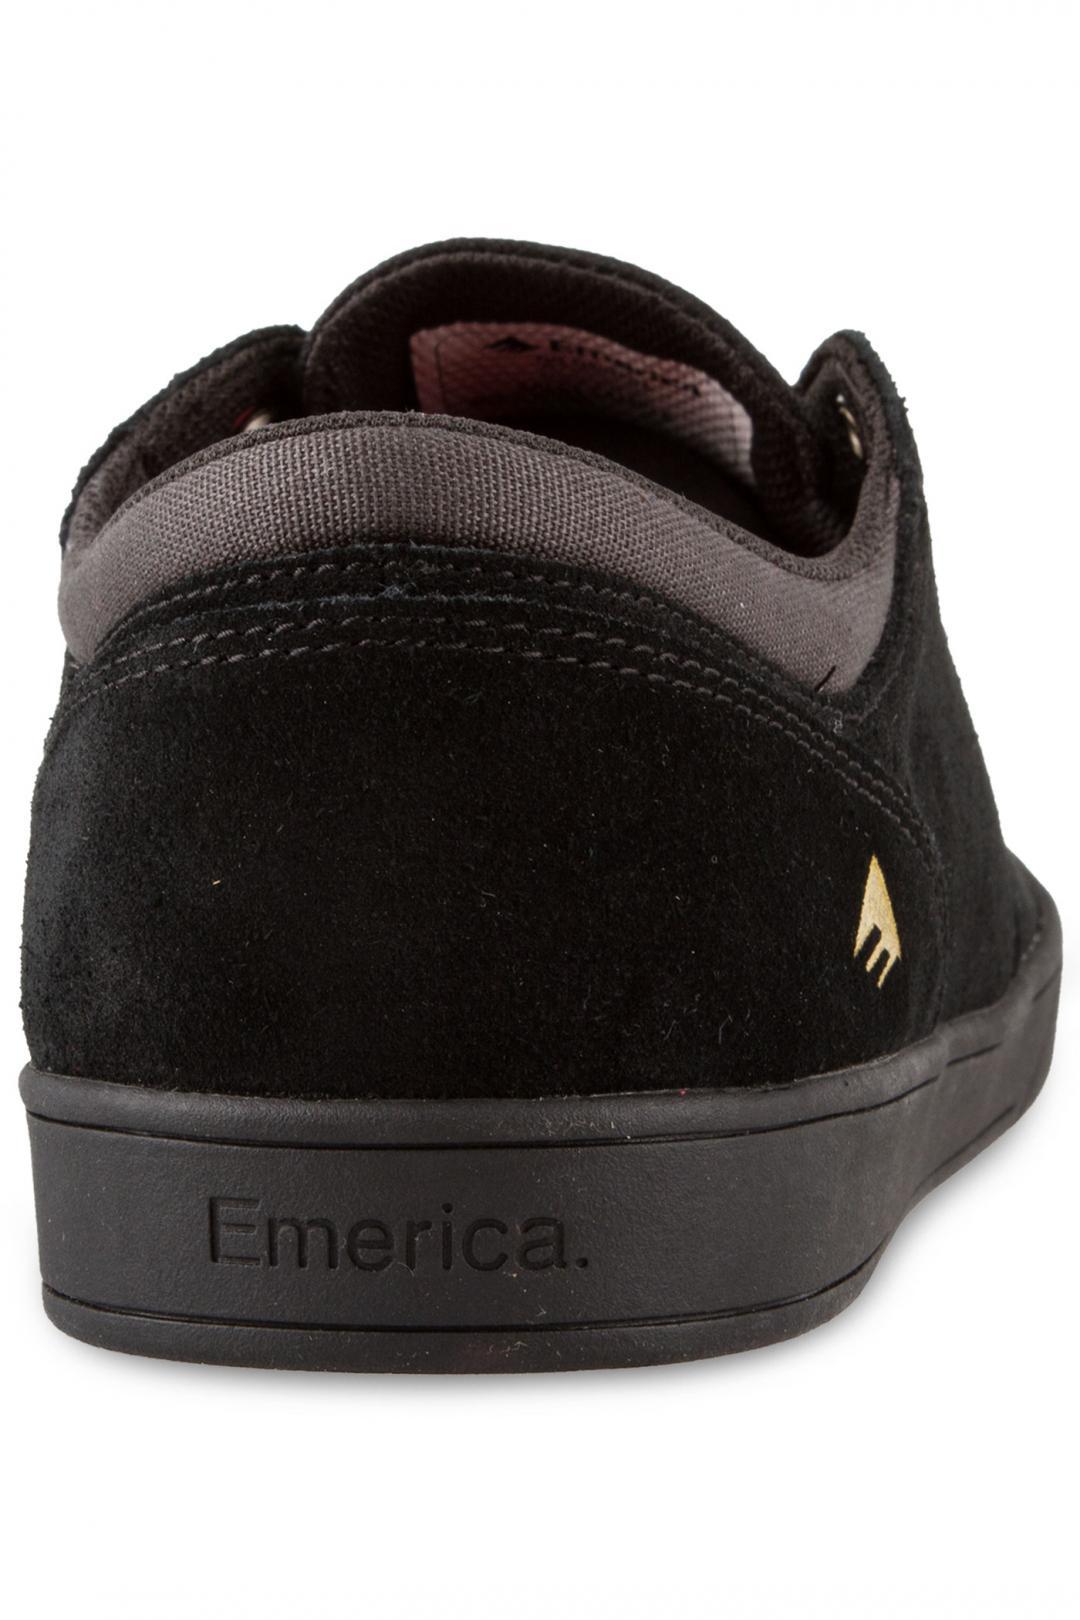 Uomo Emerica The Figueroa Suede black black | Scarpe da skate